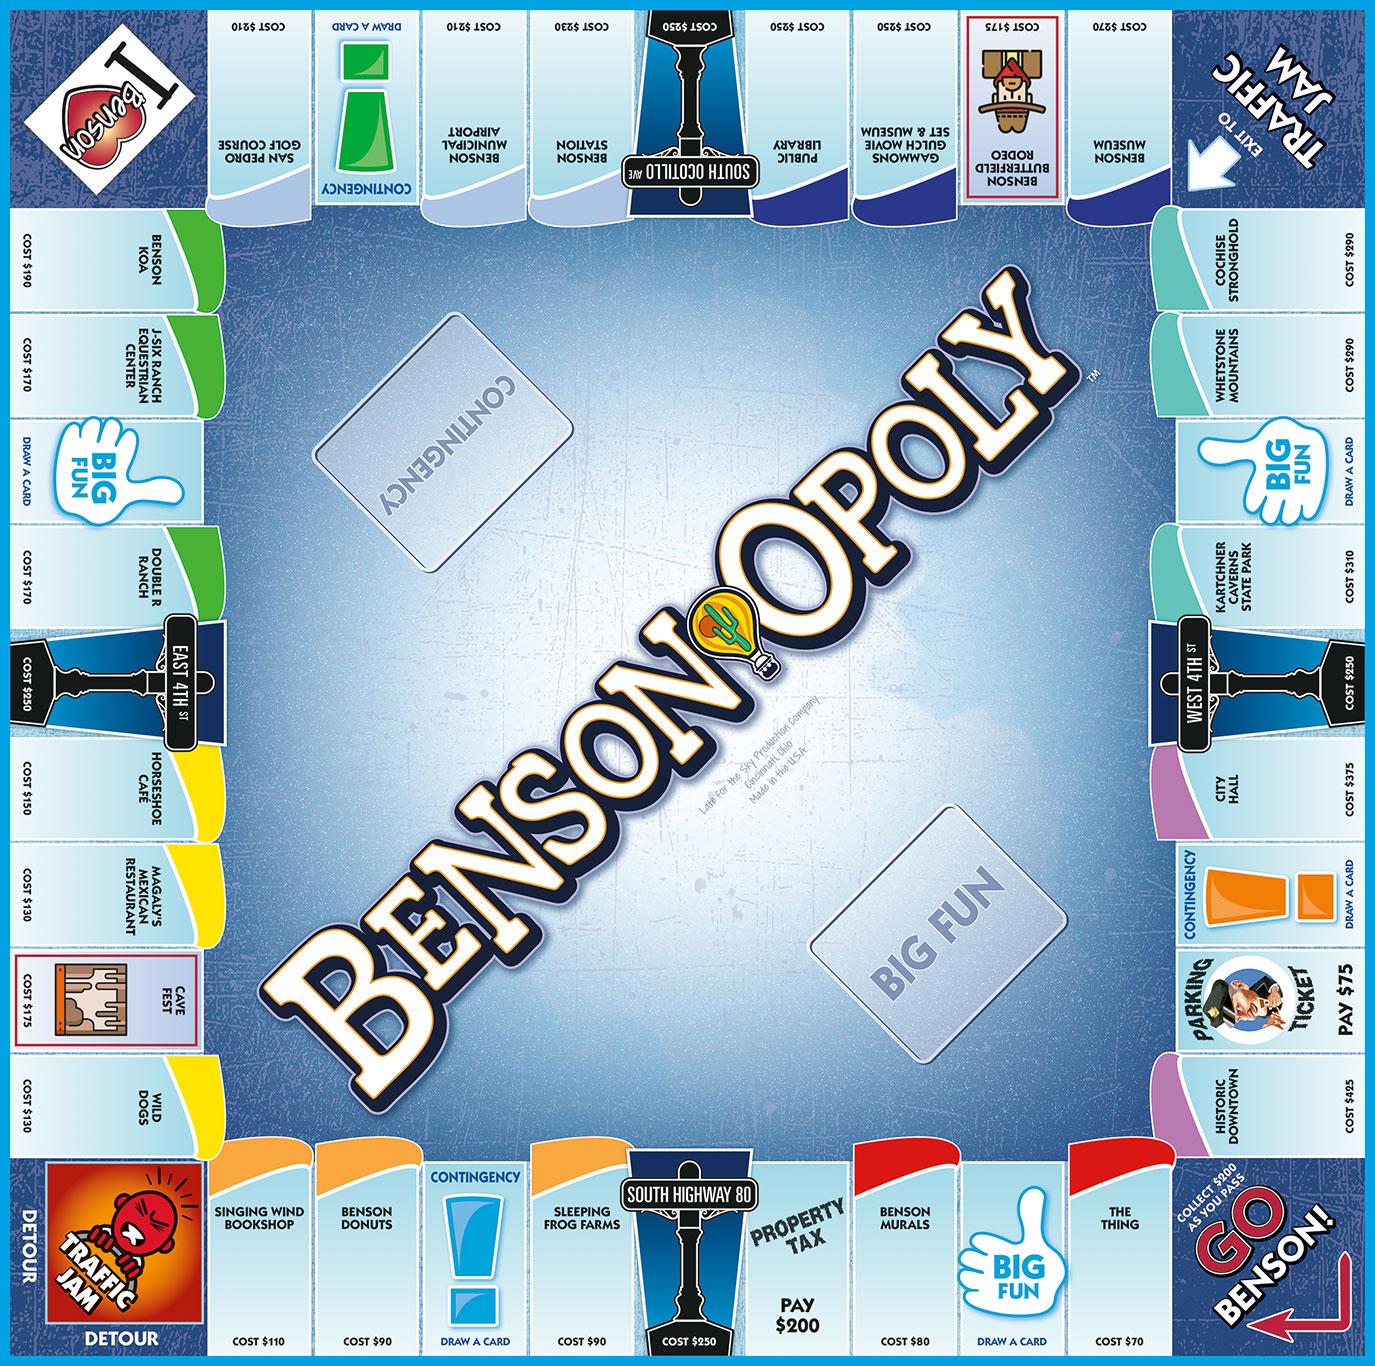 BENSON-OPOLY Board Game